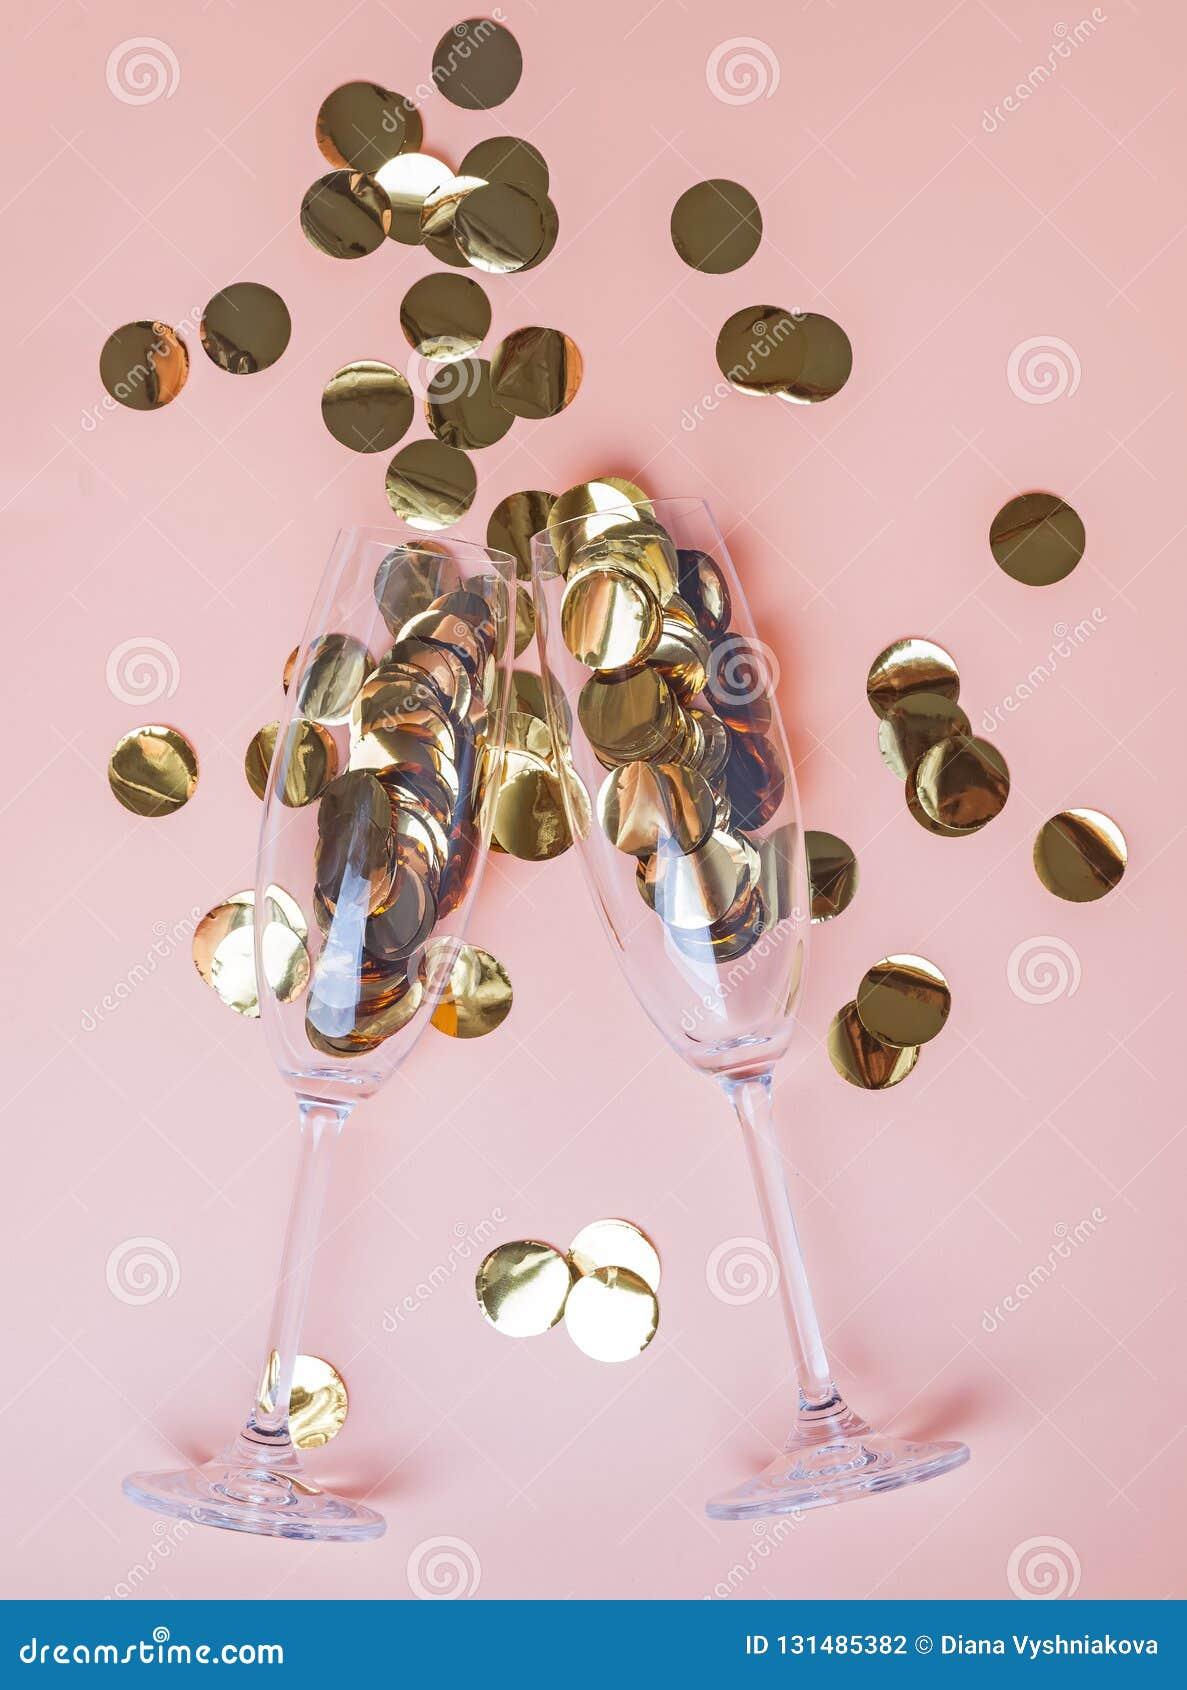 Golden confetti in champagne glasses on the peach color background